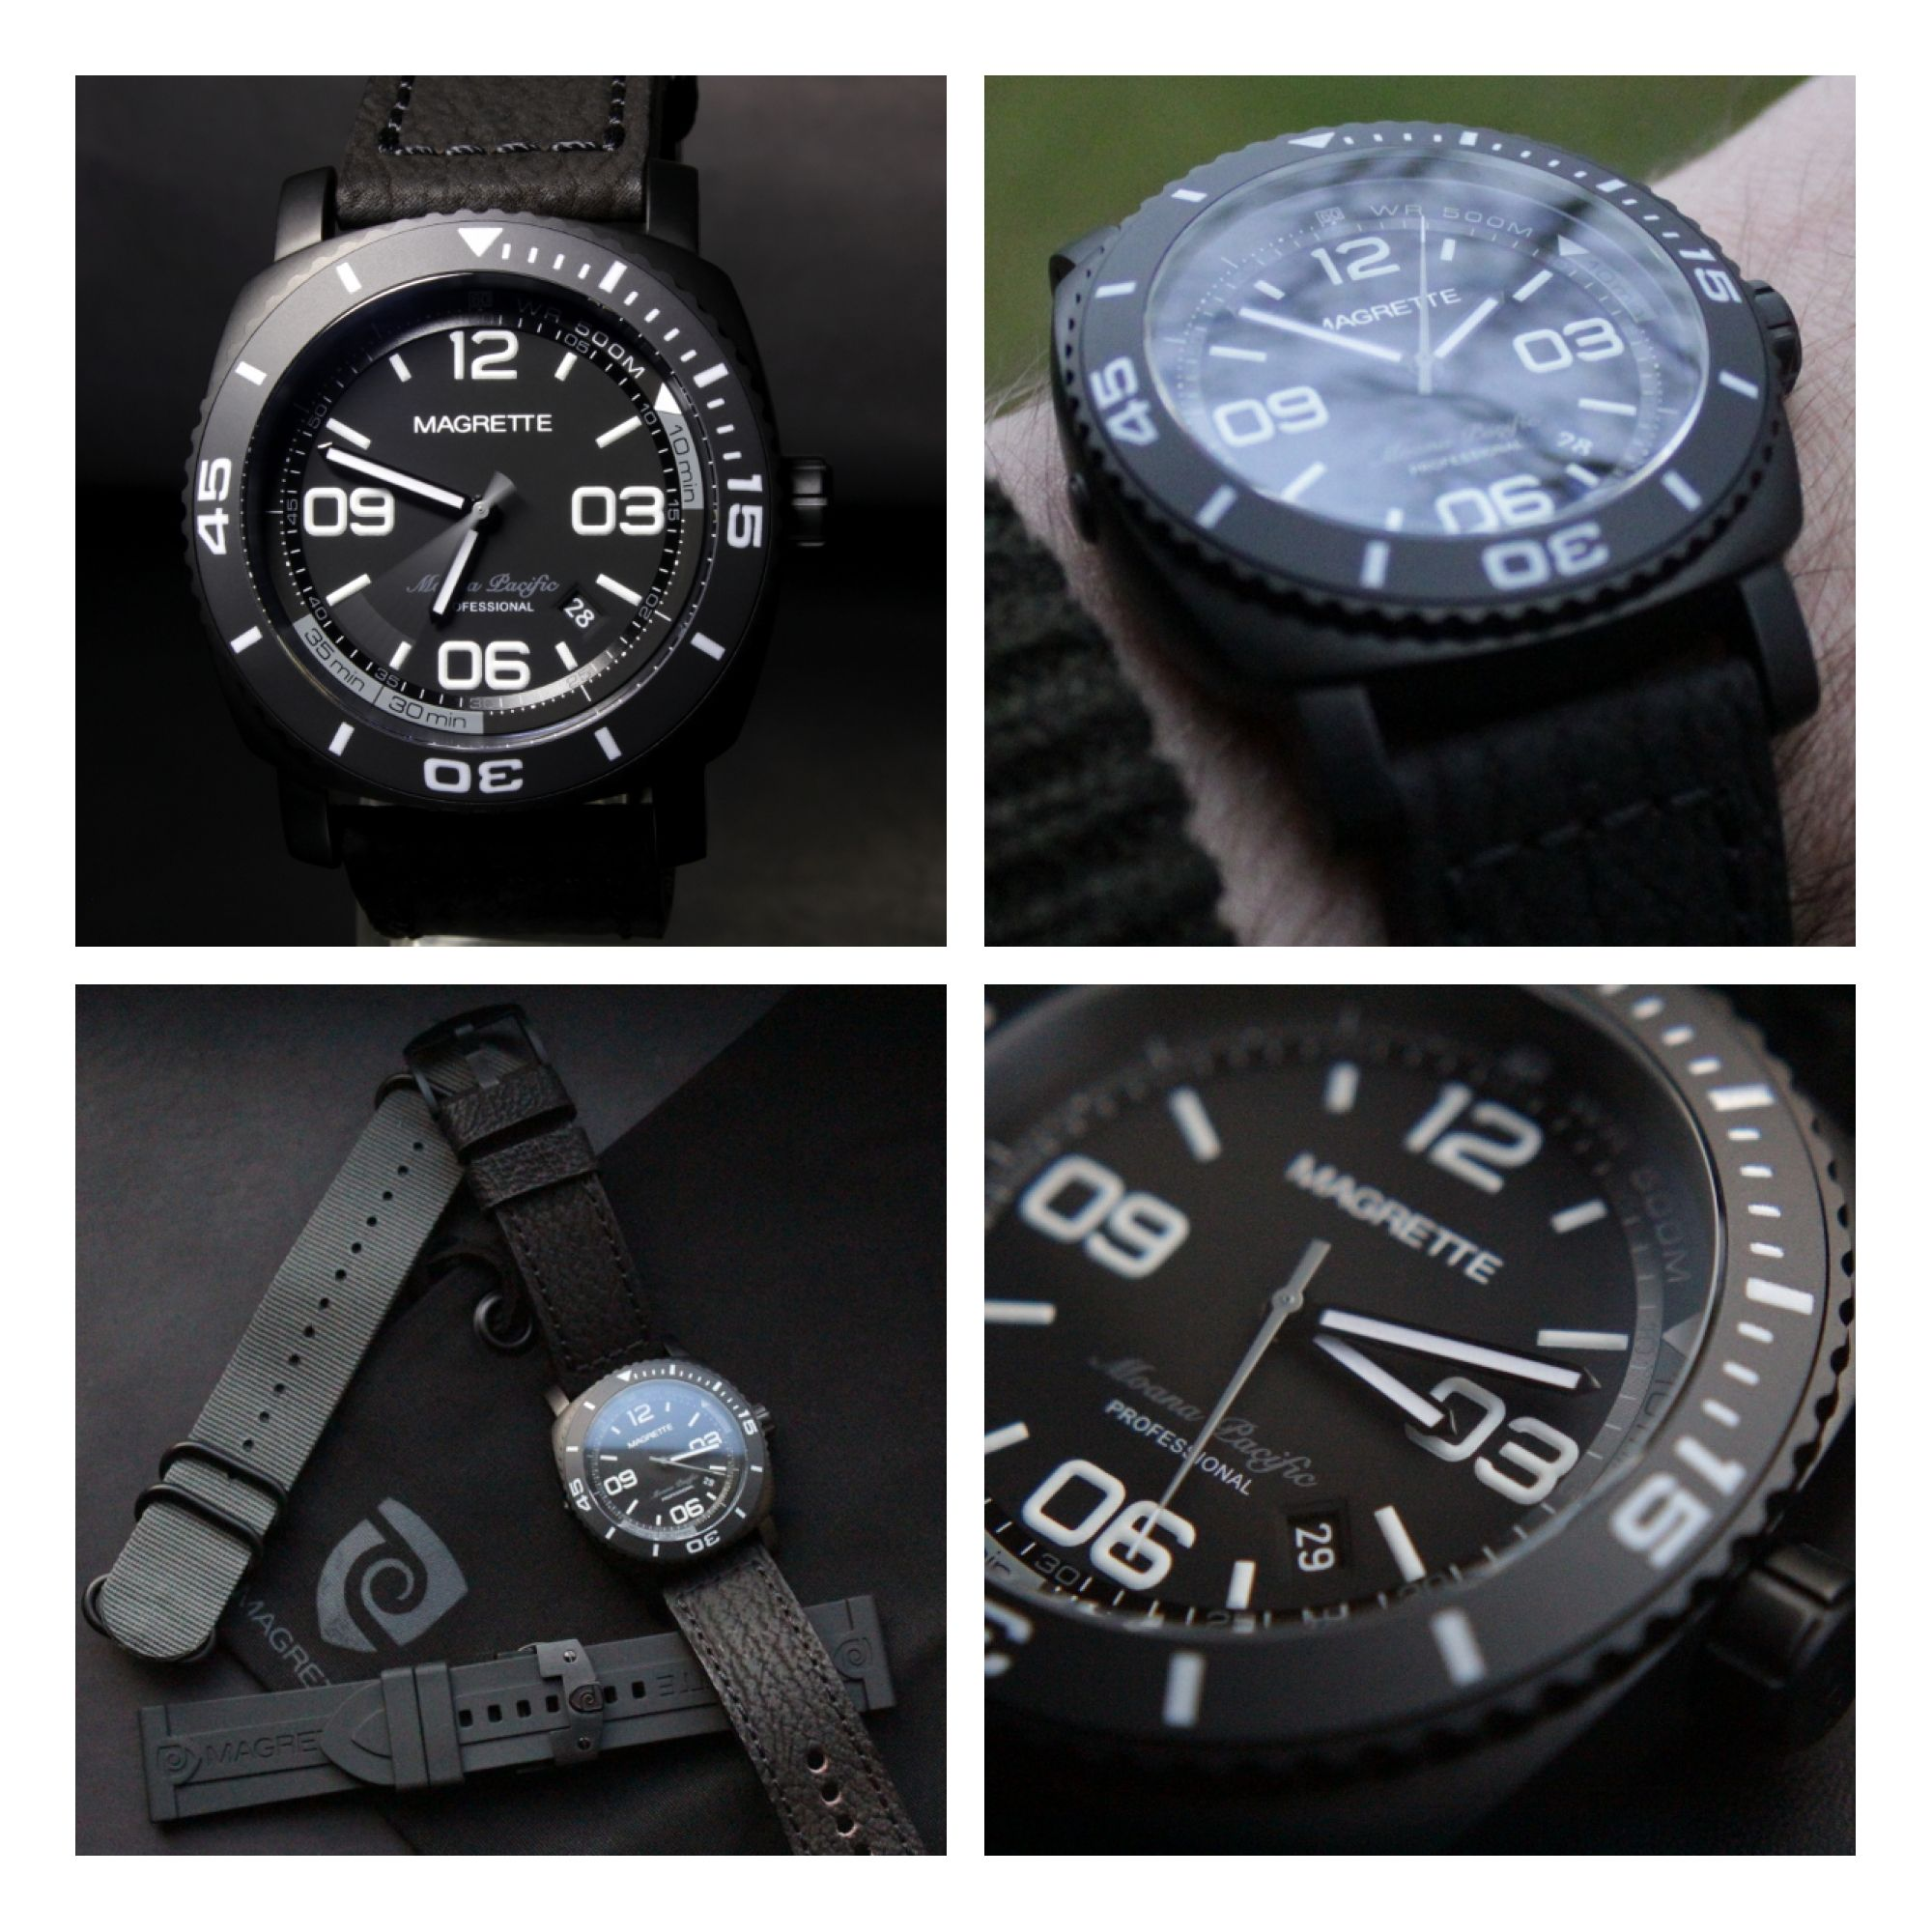 Magrette Moana Pacific Diver Pro PVD/All Black